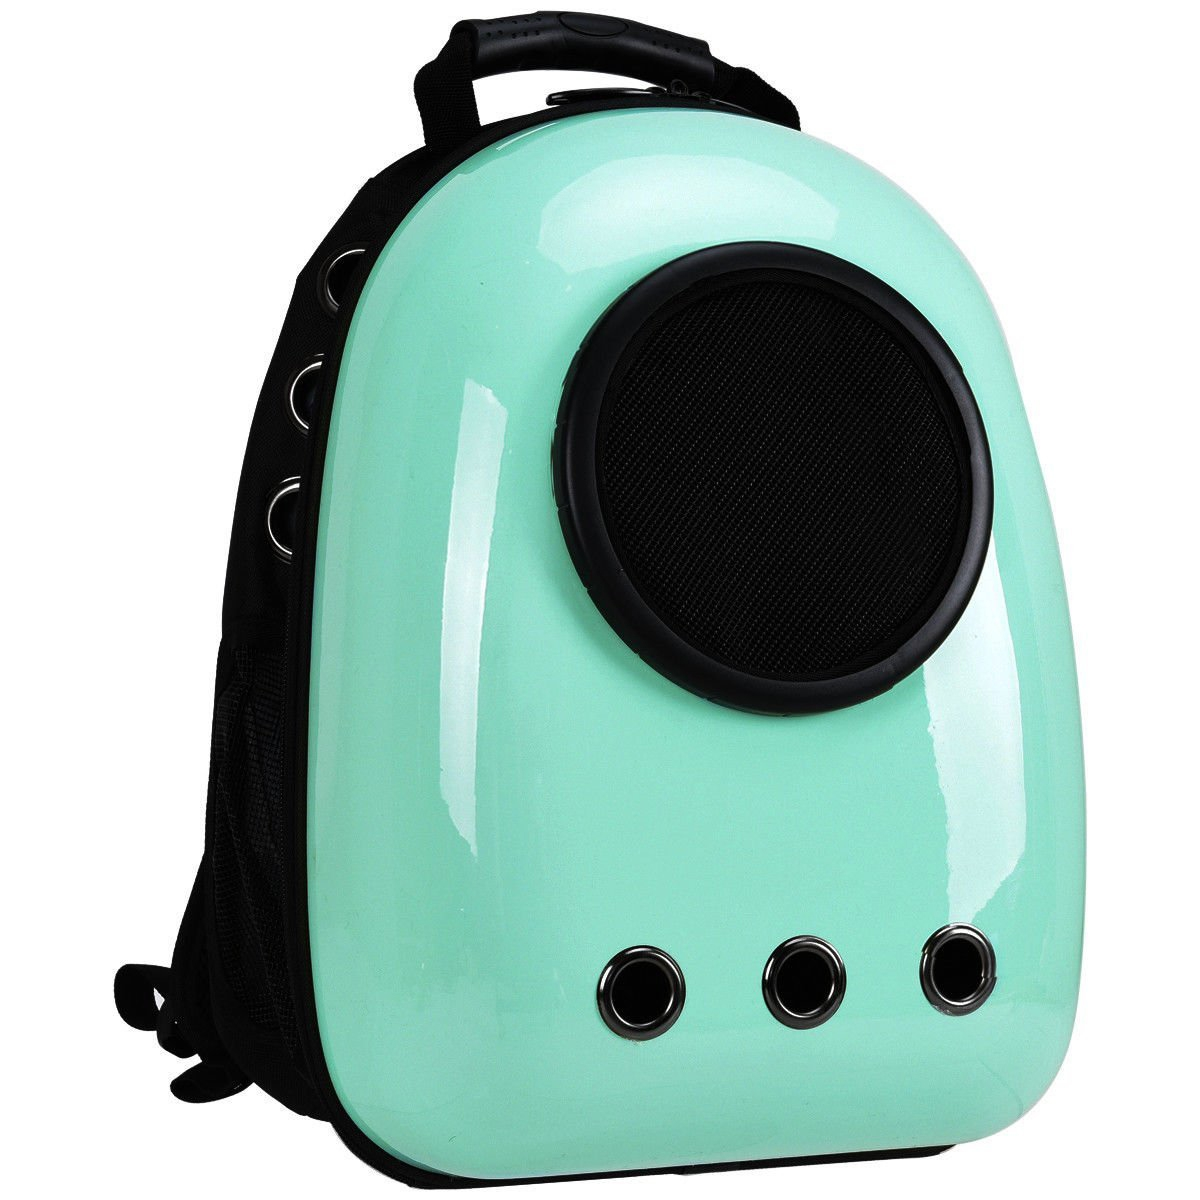 Giantex-Astronaut-Pet-Cat-Dog-Puppy-Carrier-Without-Bubble